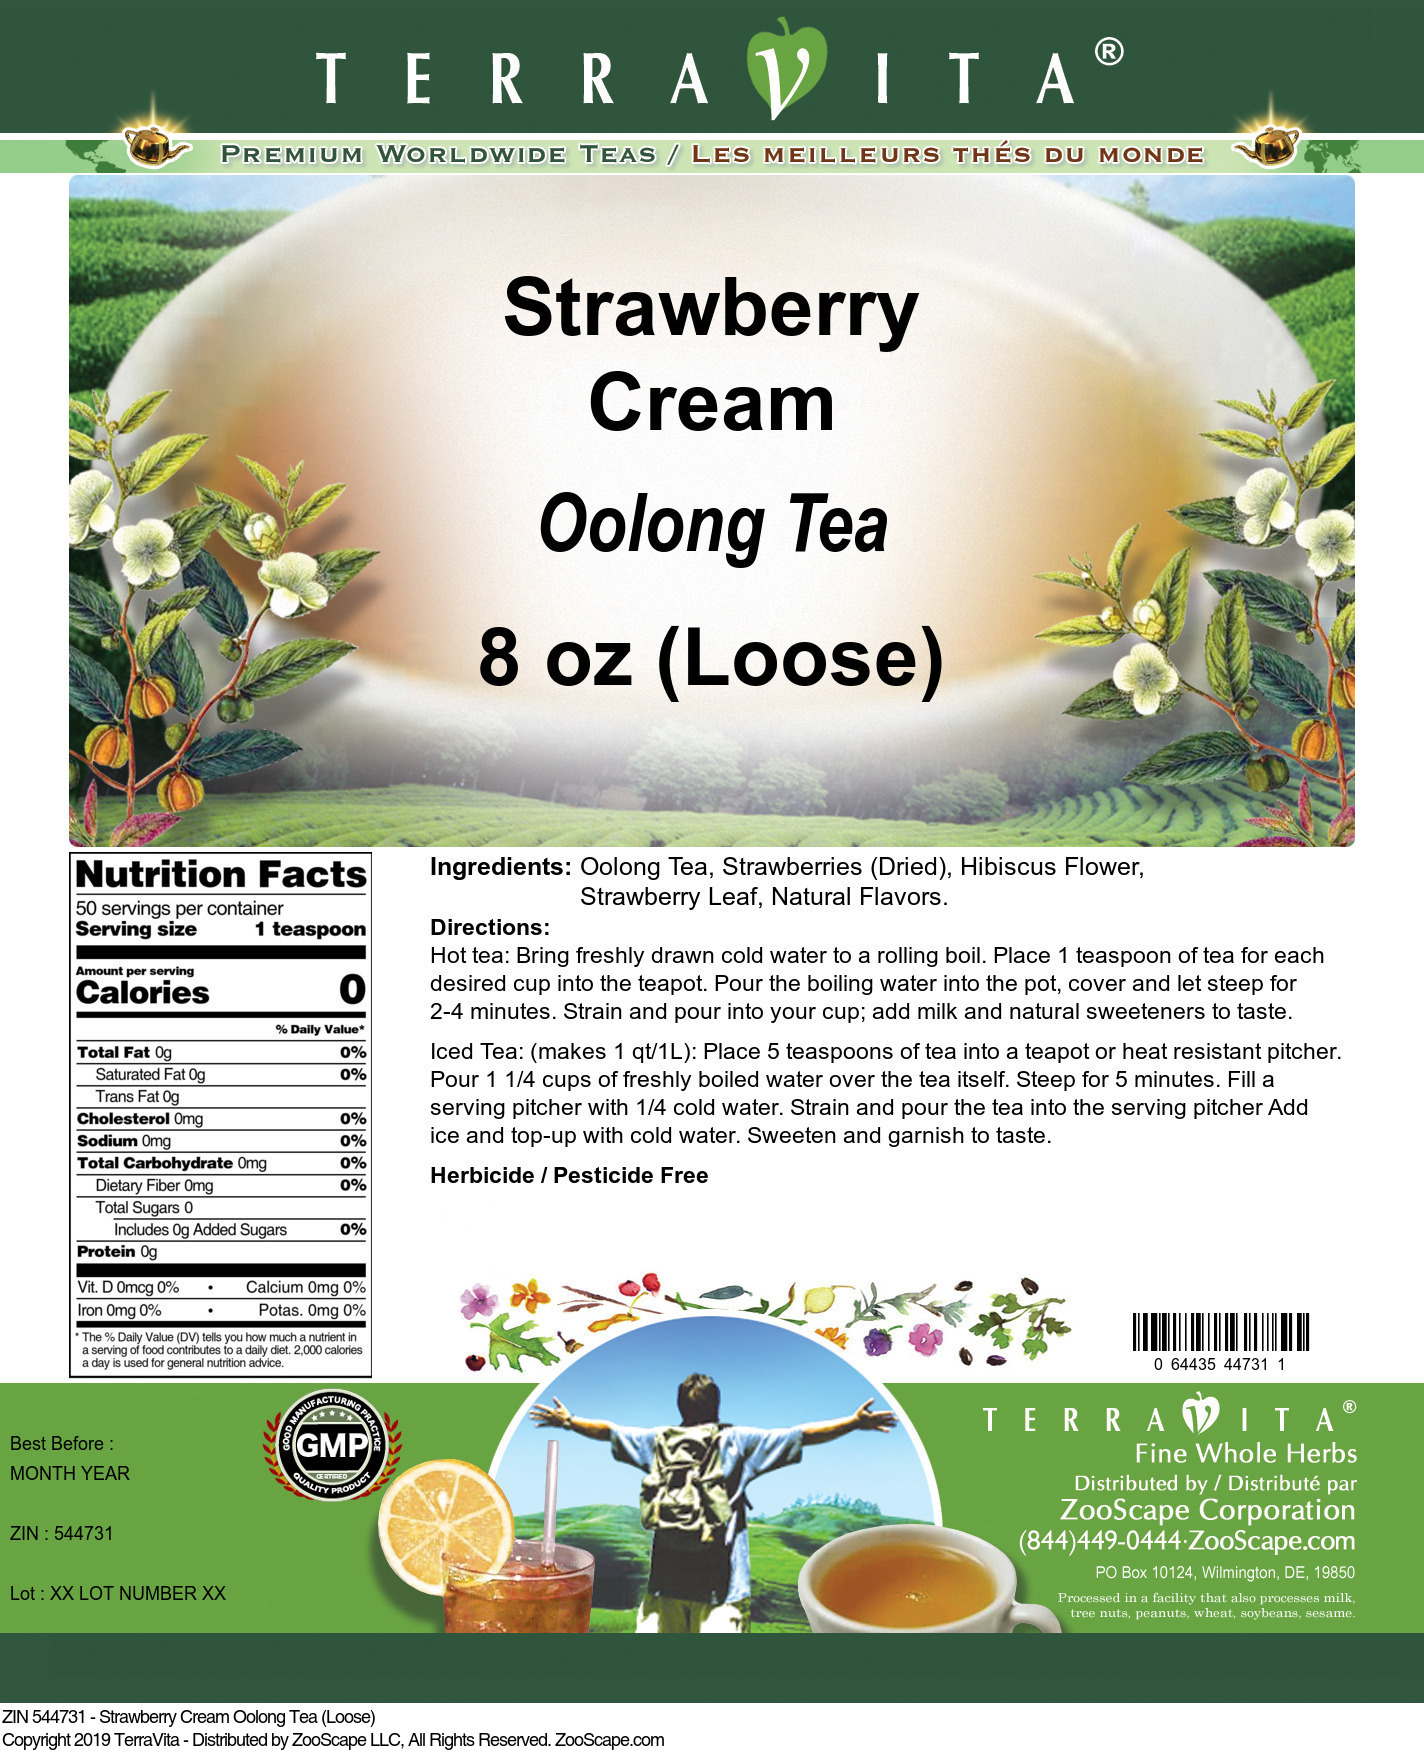 Strawberry Cream Oolong Tea (Loose)